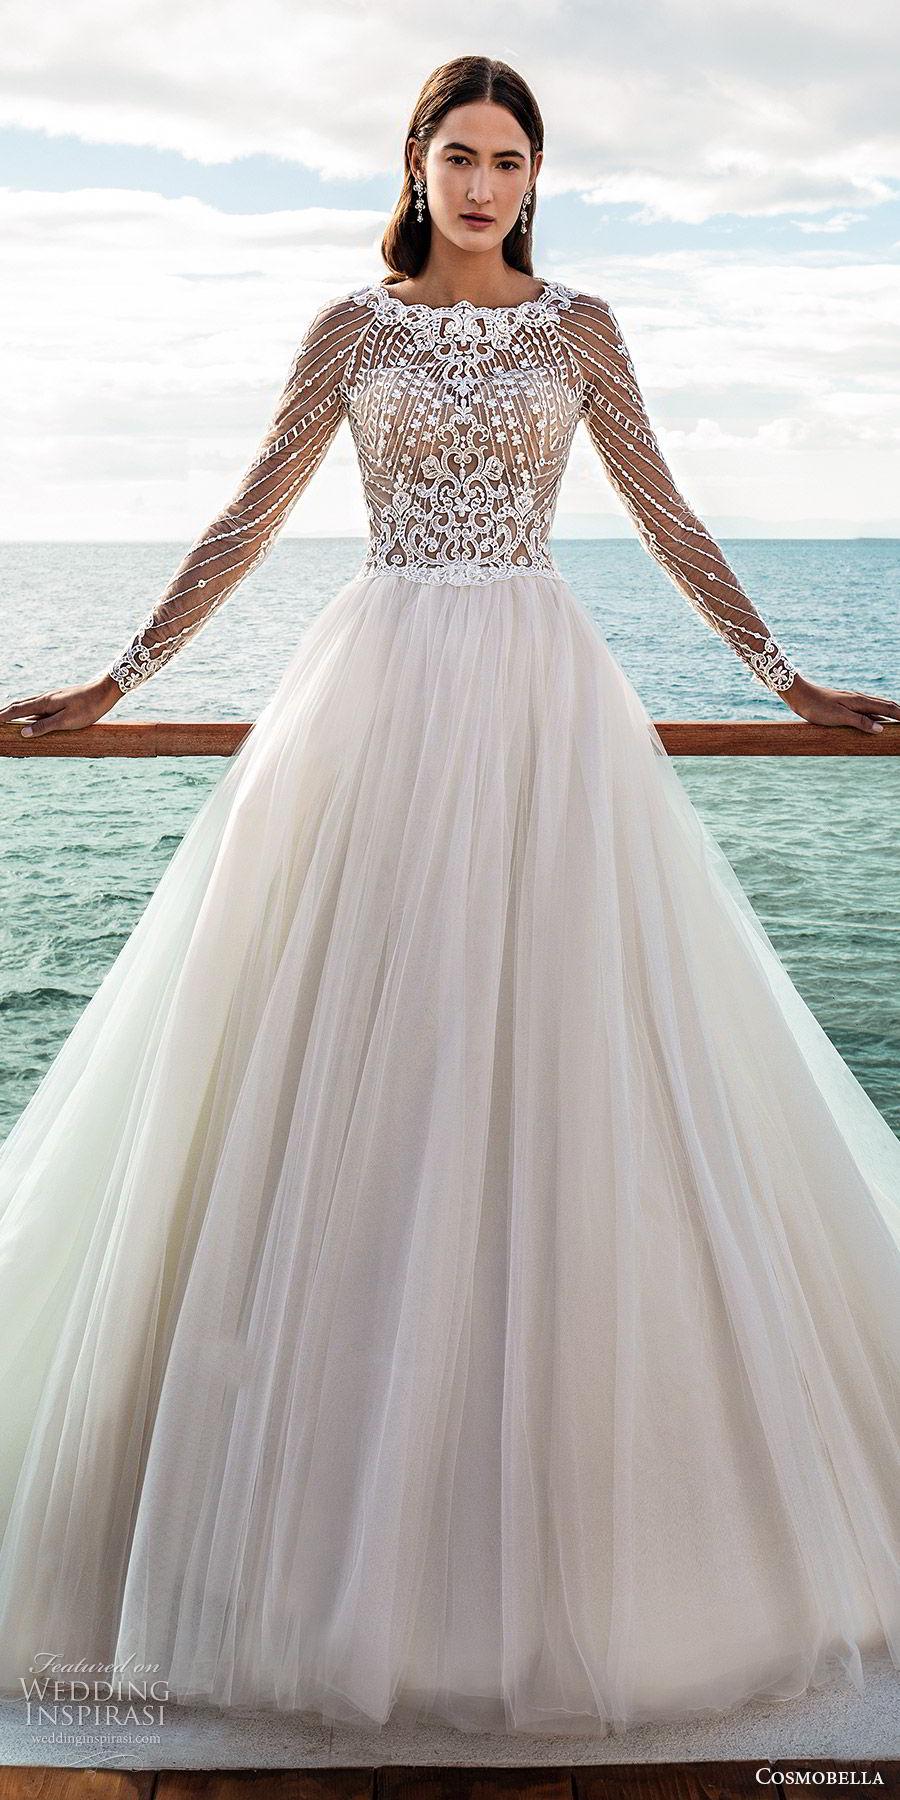 cosmobella 2020 bridal illusion long sleeves jewel neck sheer embellished bodice a line ball gown wedding dress (20) romantic princess chapel train cutout back mv